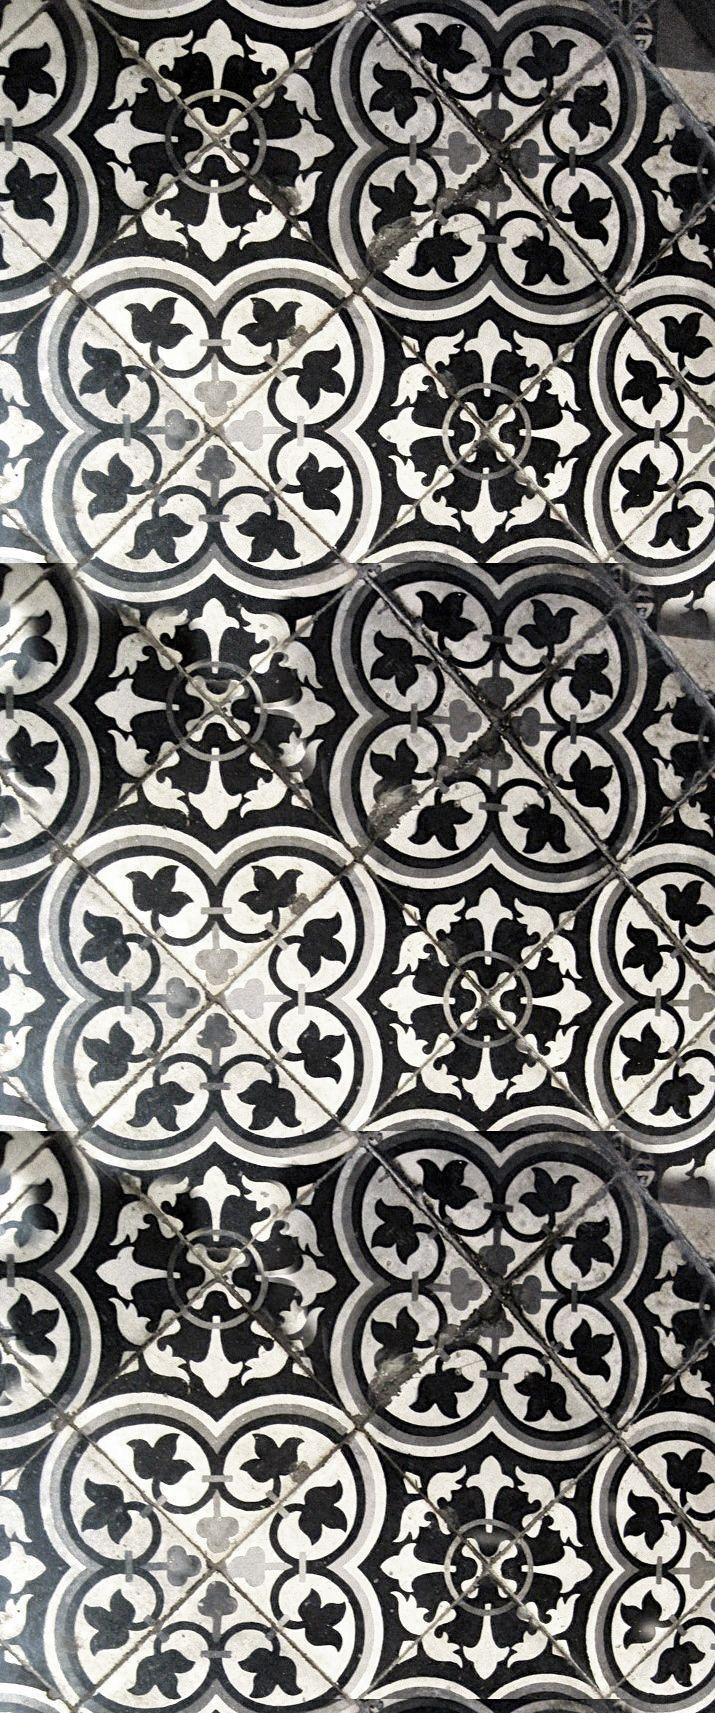 Mejores 56 imágenes de Cosas en gris   Gray Stuff en Pinterest ... 2e8d244283b